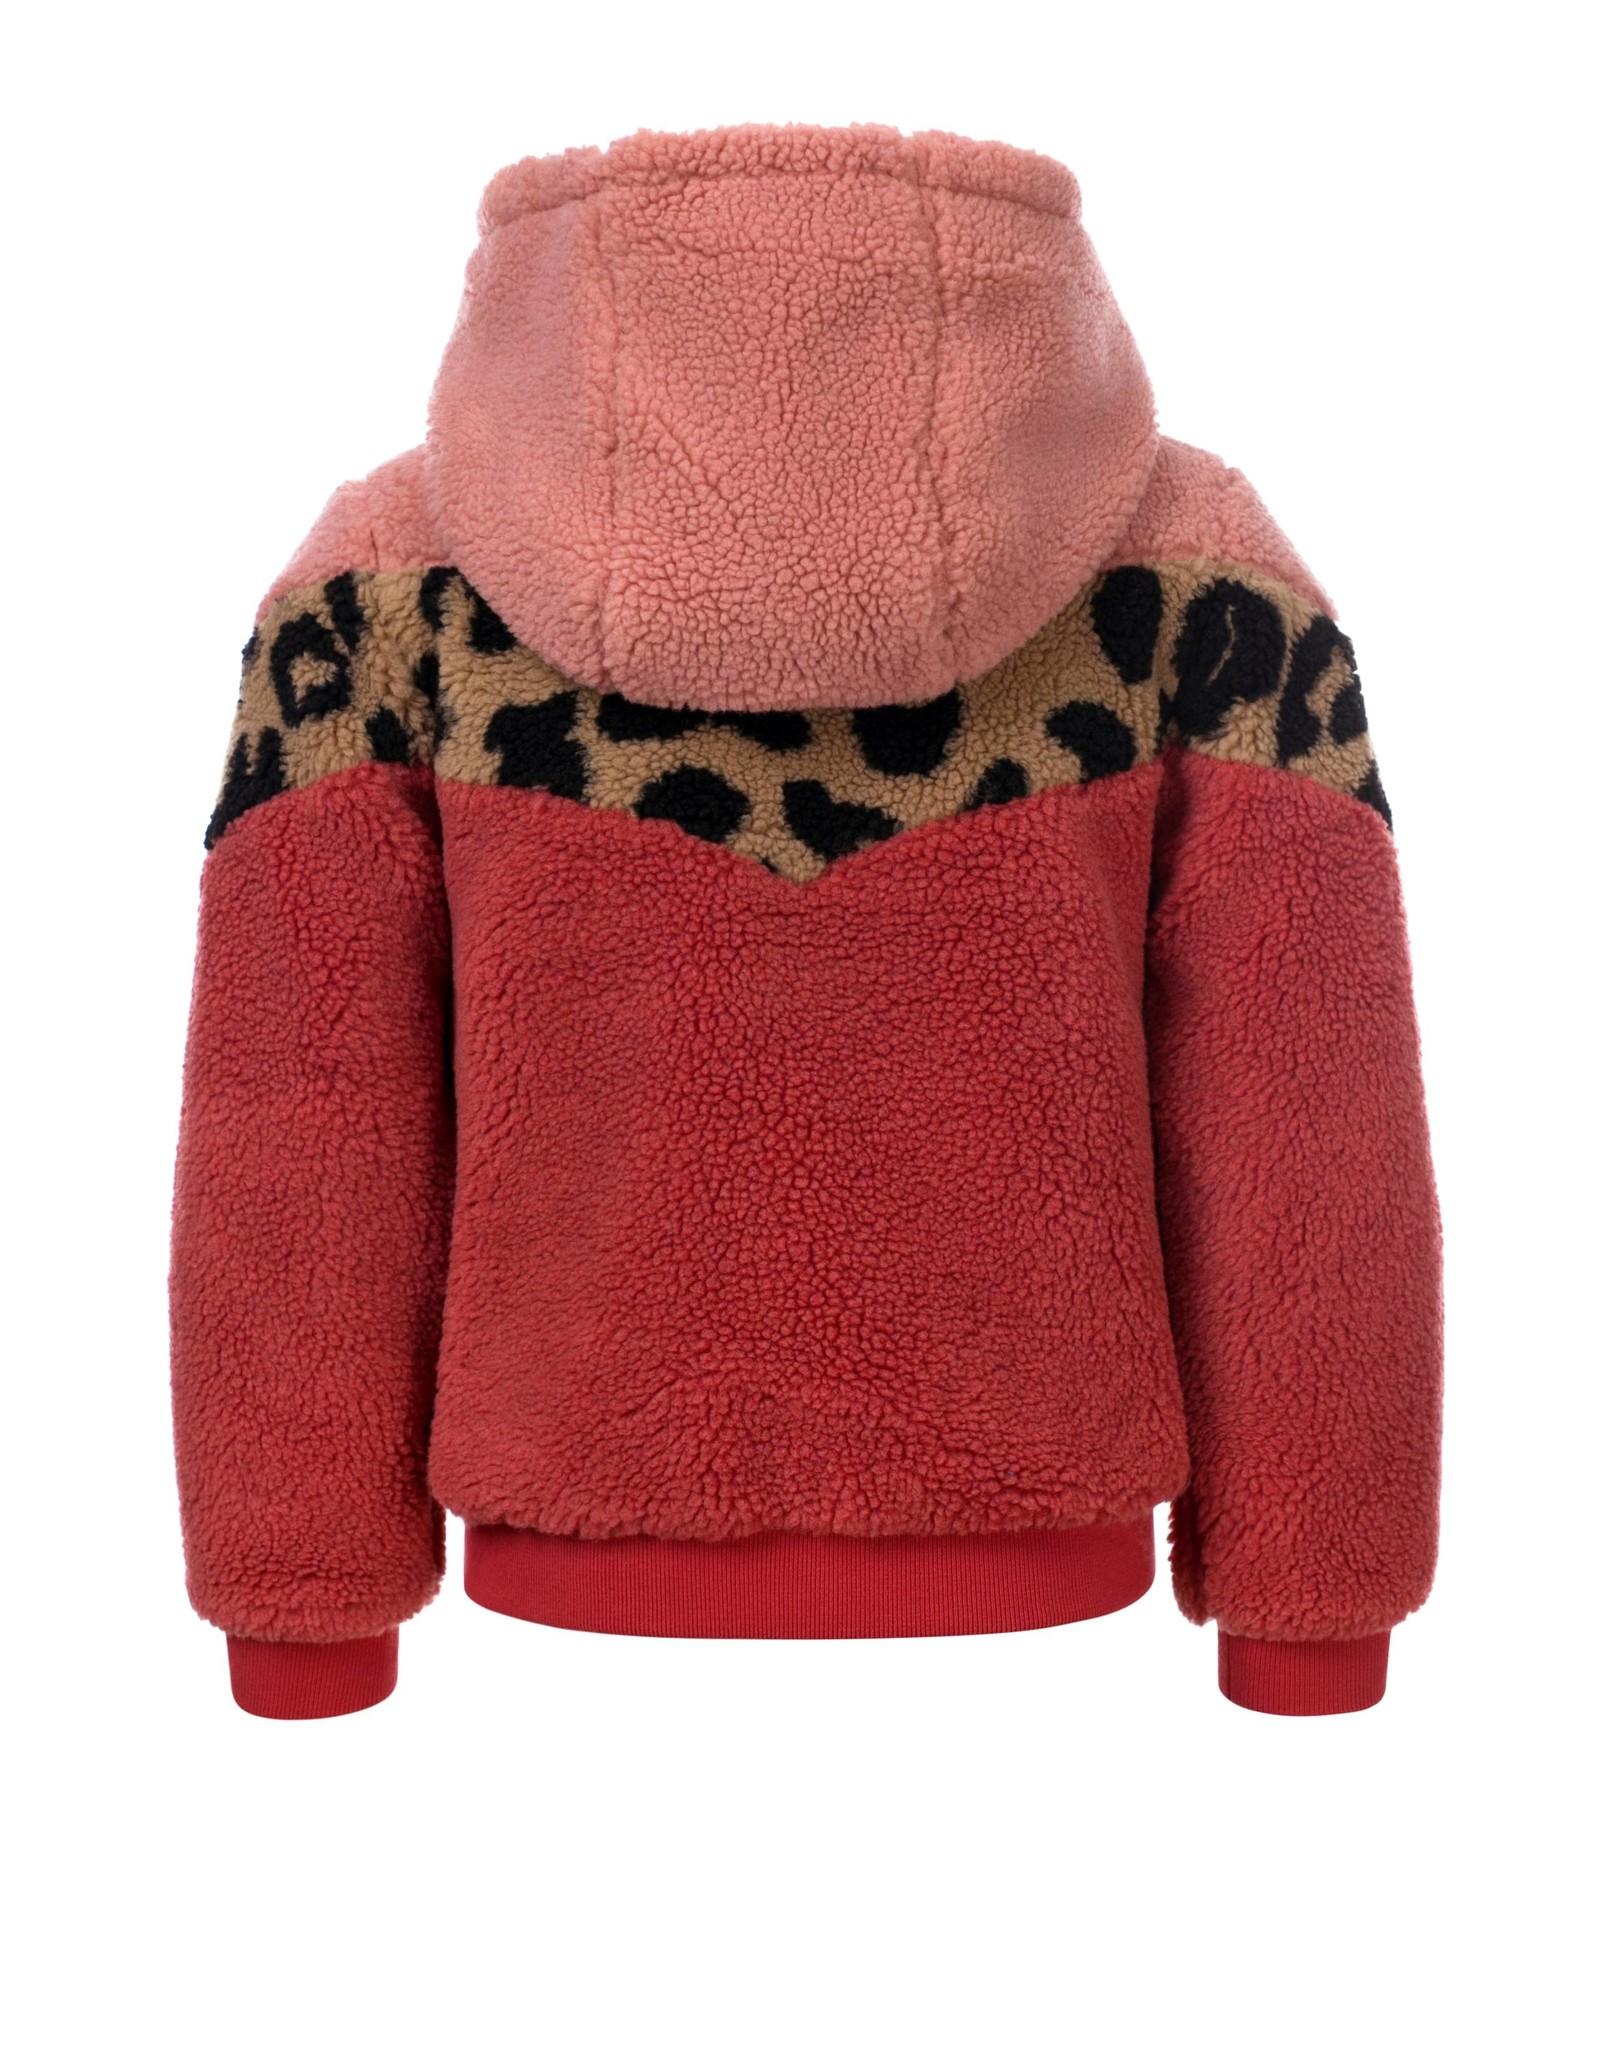 LOOXS Little Little teddy hooded jacket,  Mahony